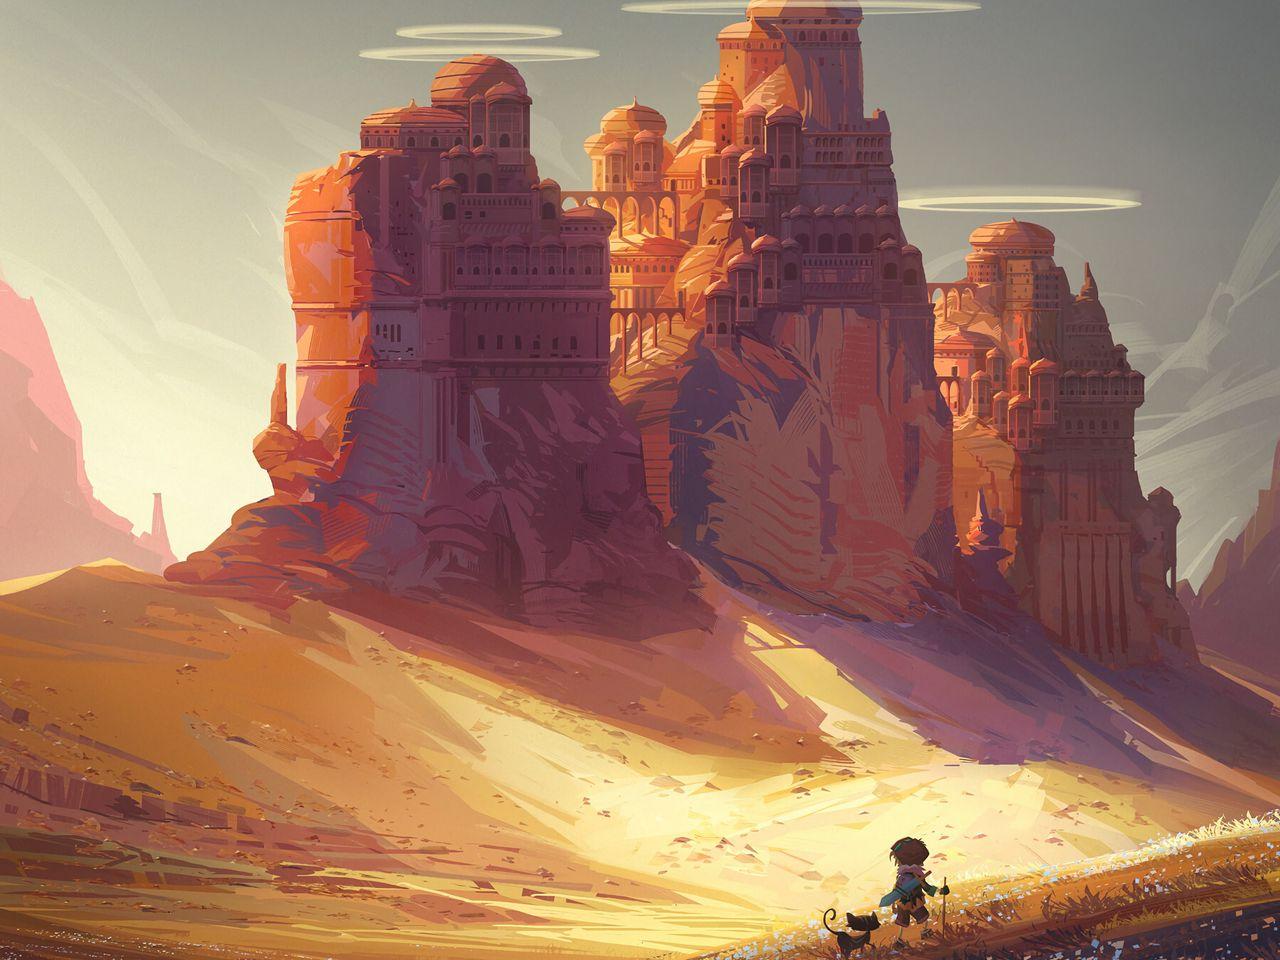 1280x960 Wallpaper friends, adventure, castle, art